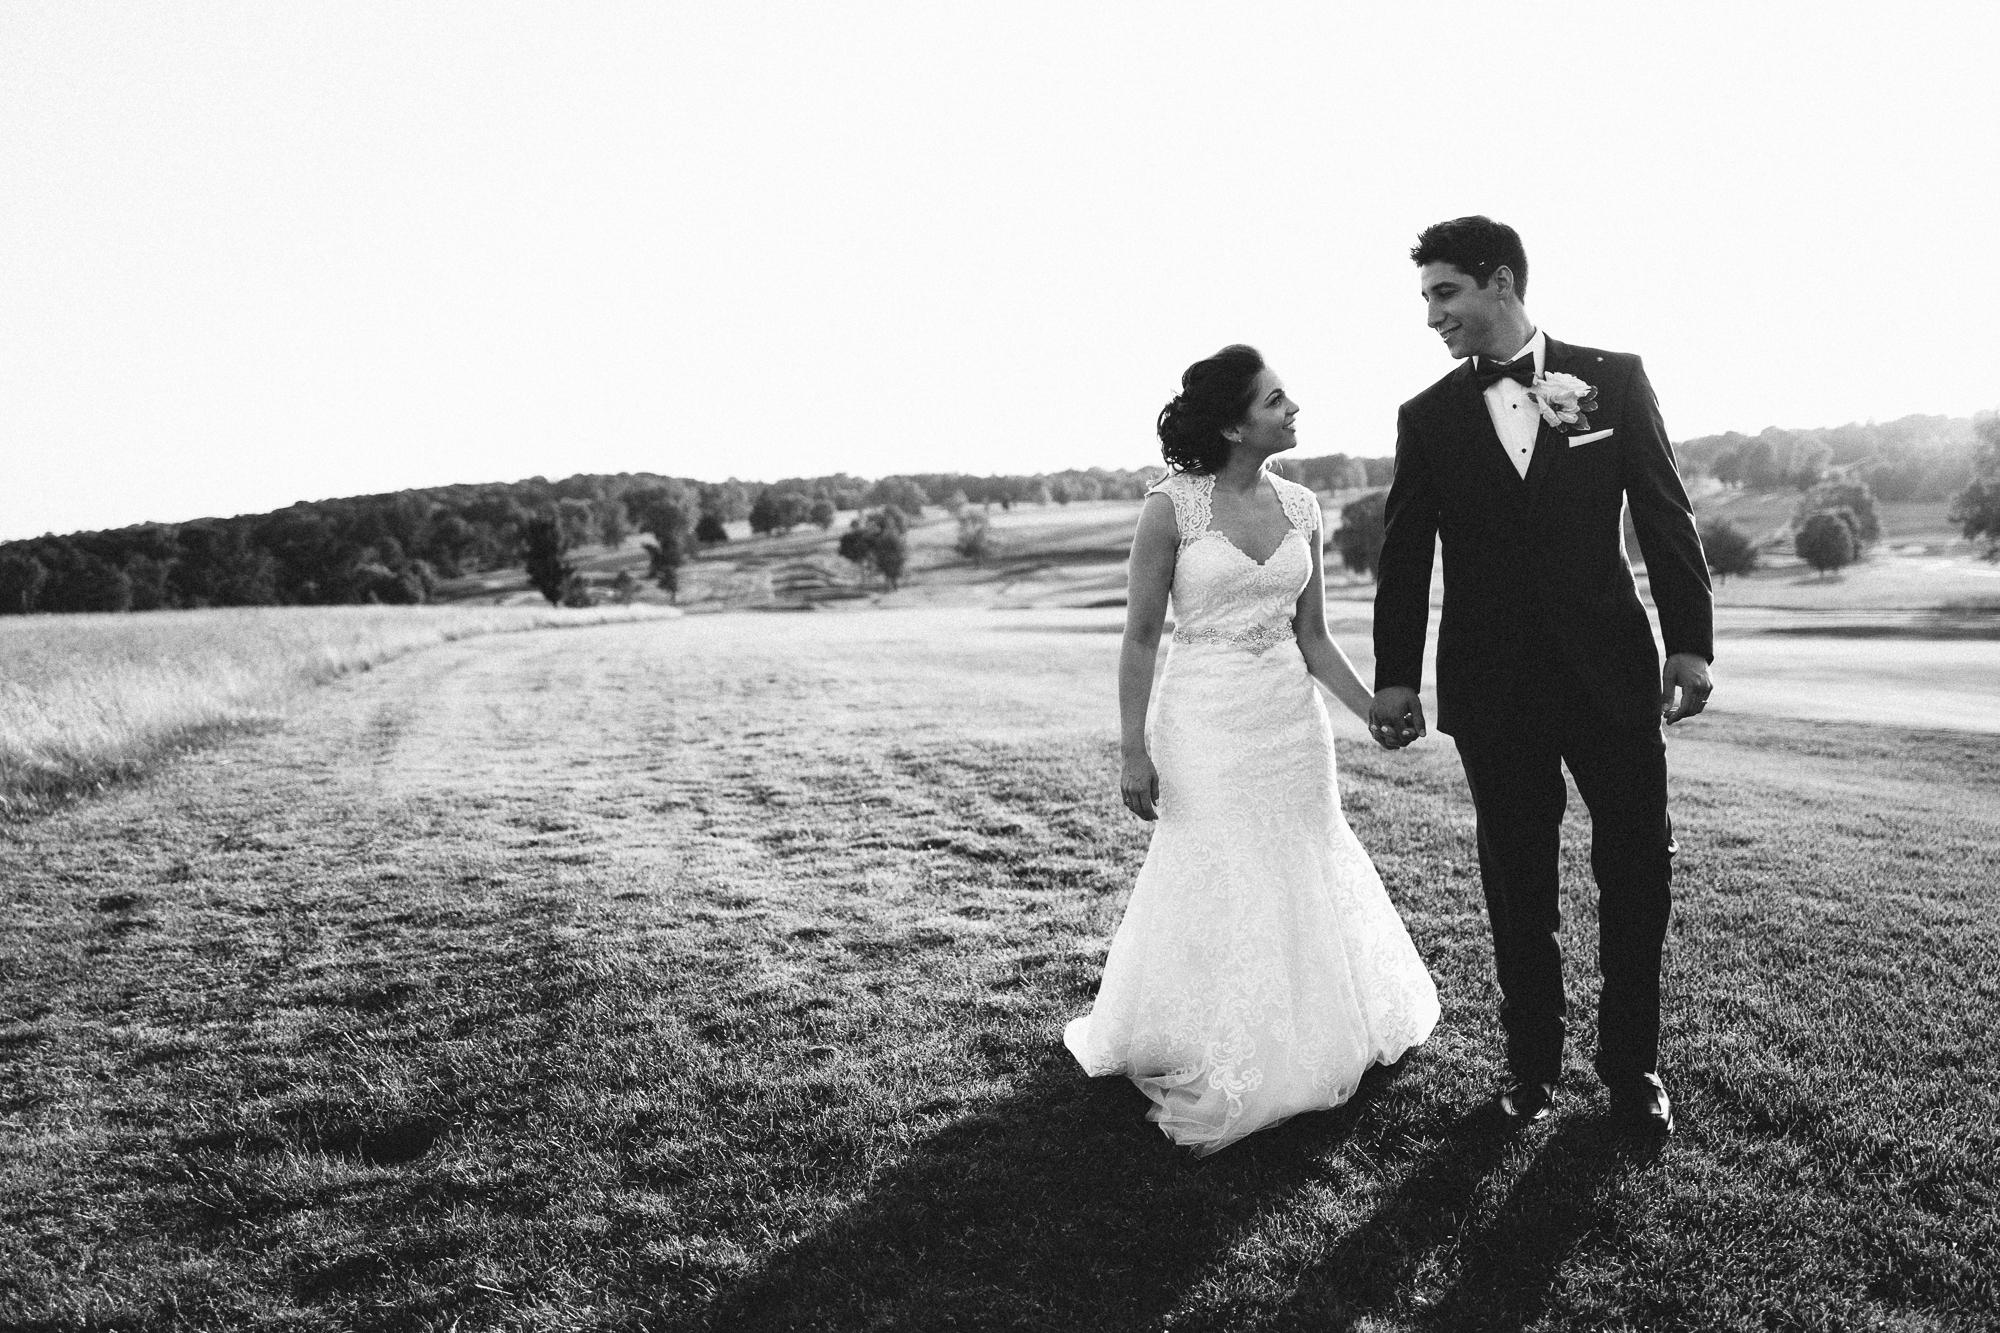 scranton-wedding-photography-zak-zavada-2016.06-rebeccaIan-0898.jpg